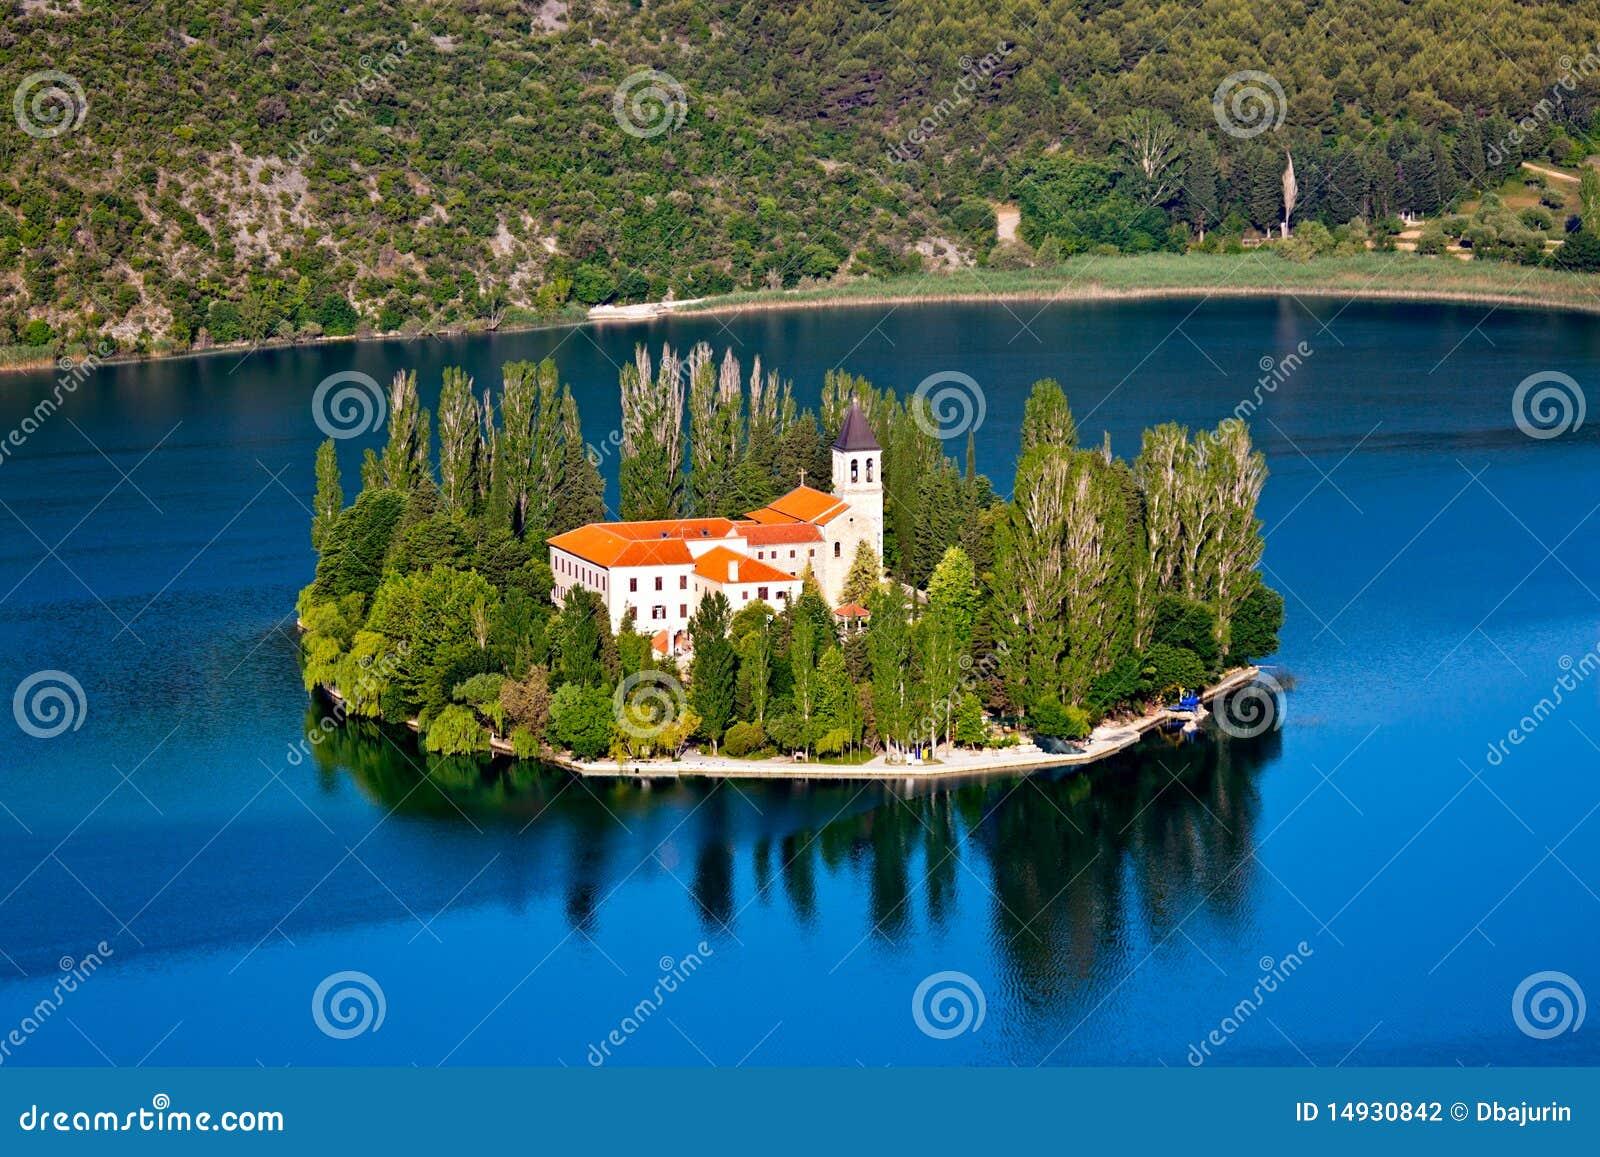 Croatia visovac